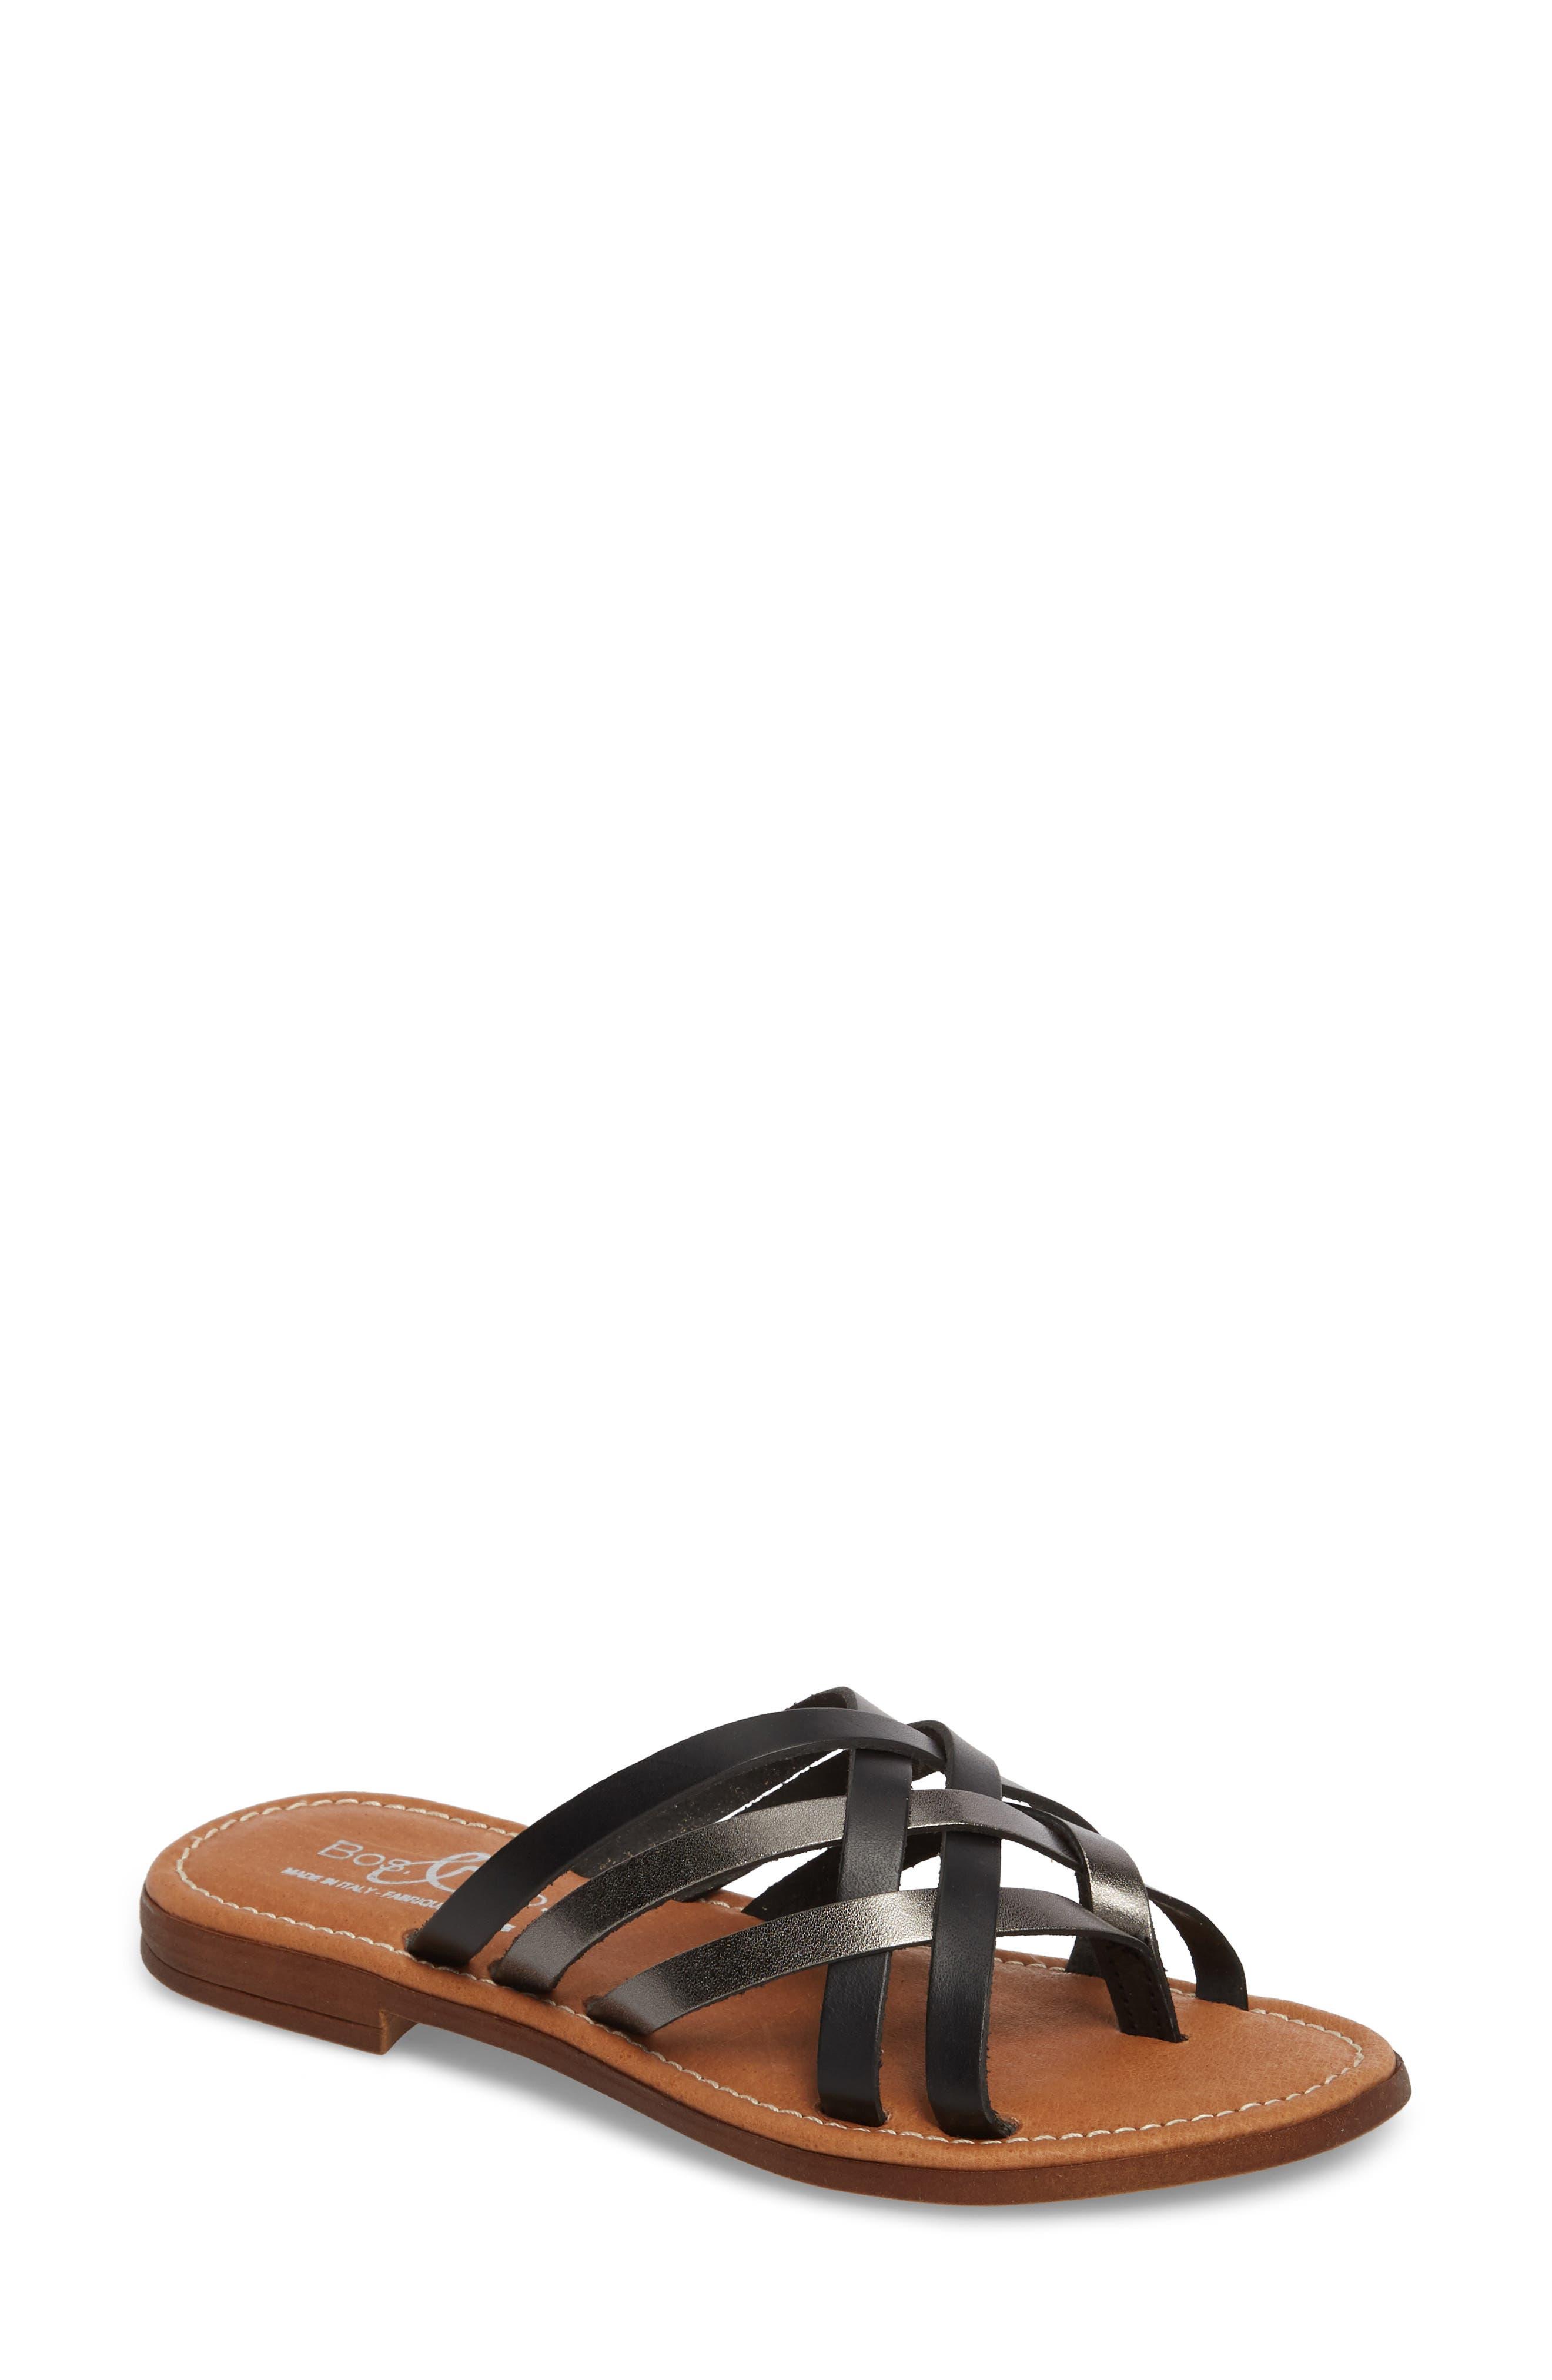 Bos. & Co. Inola Slide Sandal - Black